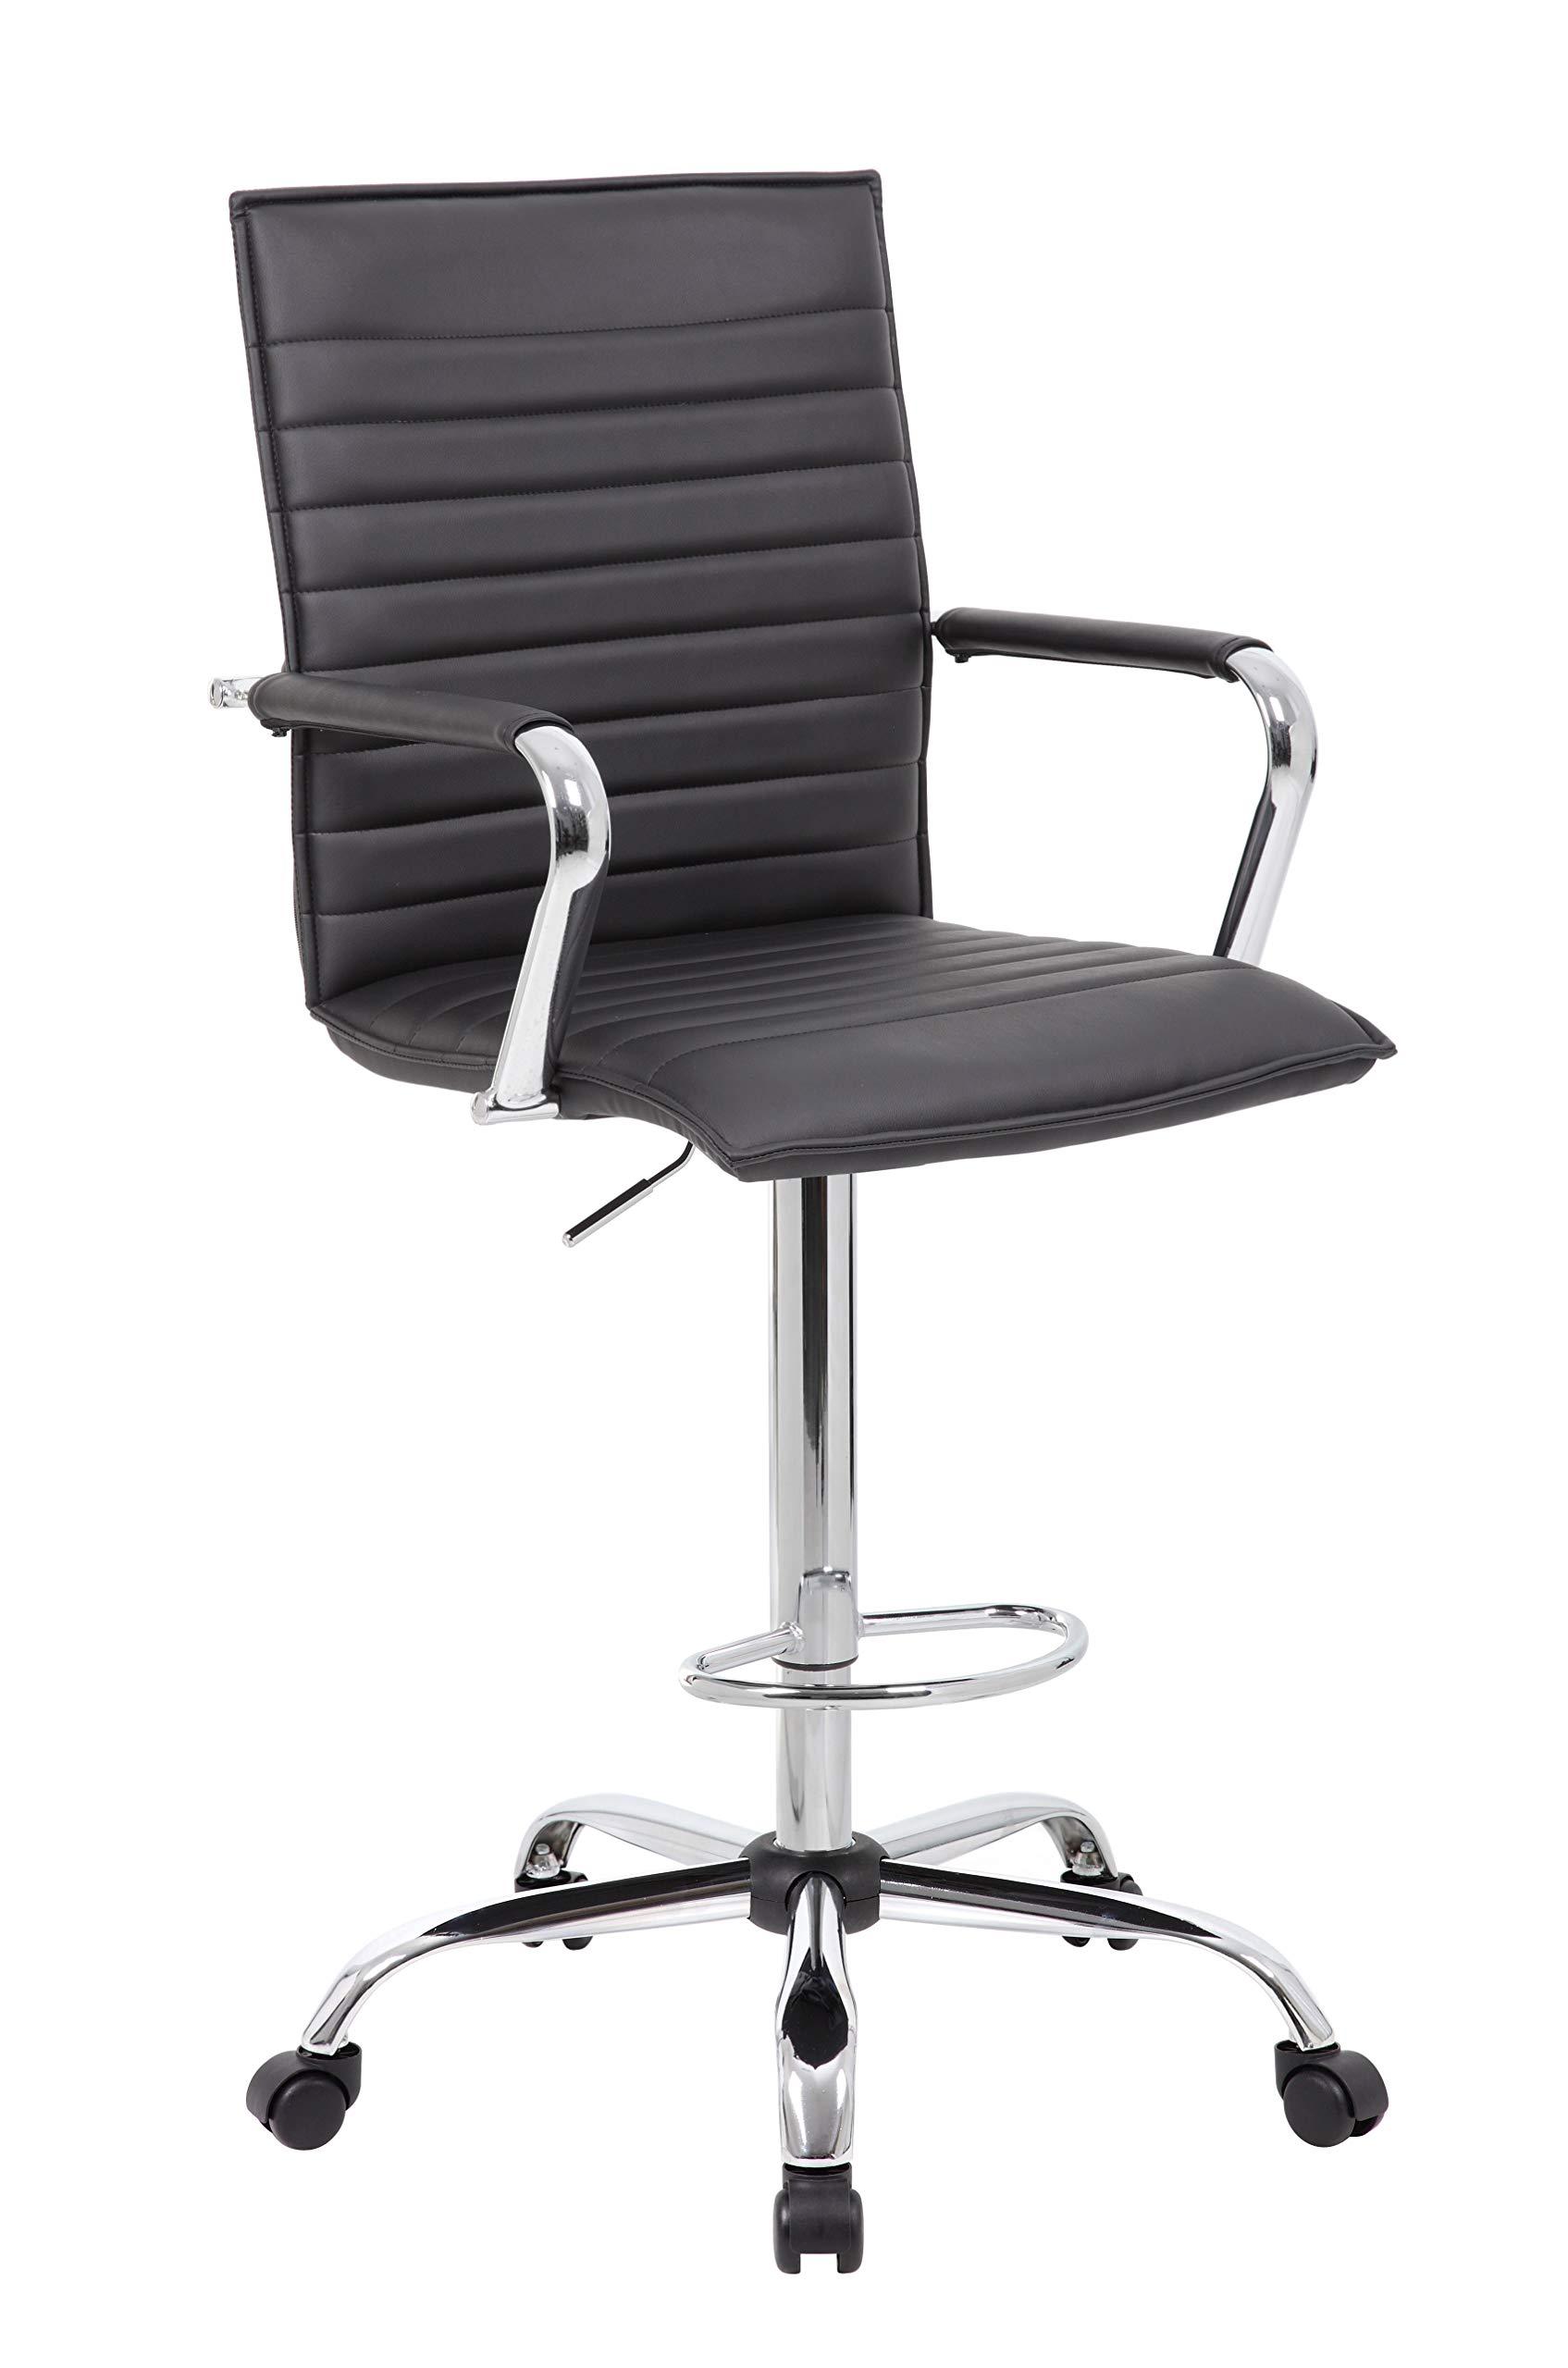 Boss Office Products B16533C-BK Drafting Stool, Black by Boss Office Products